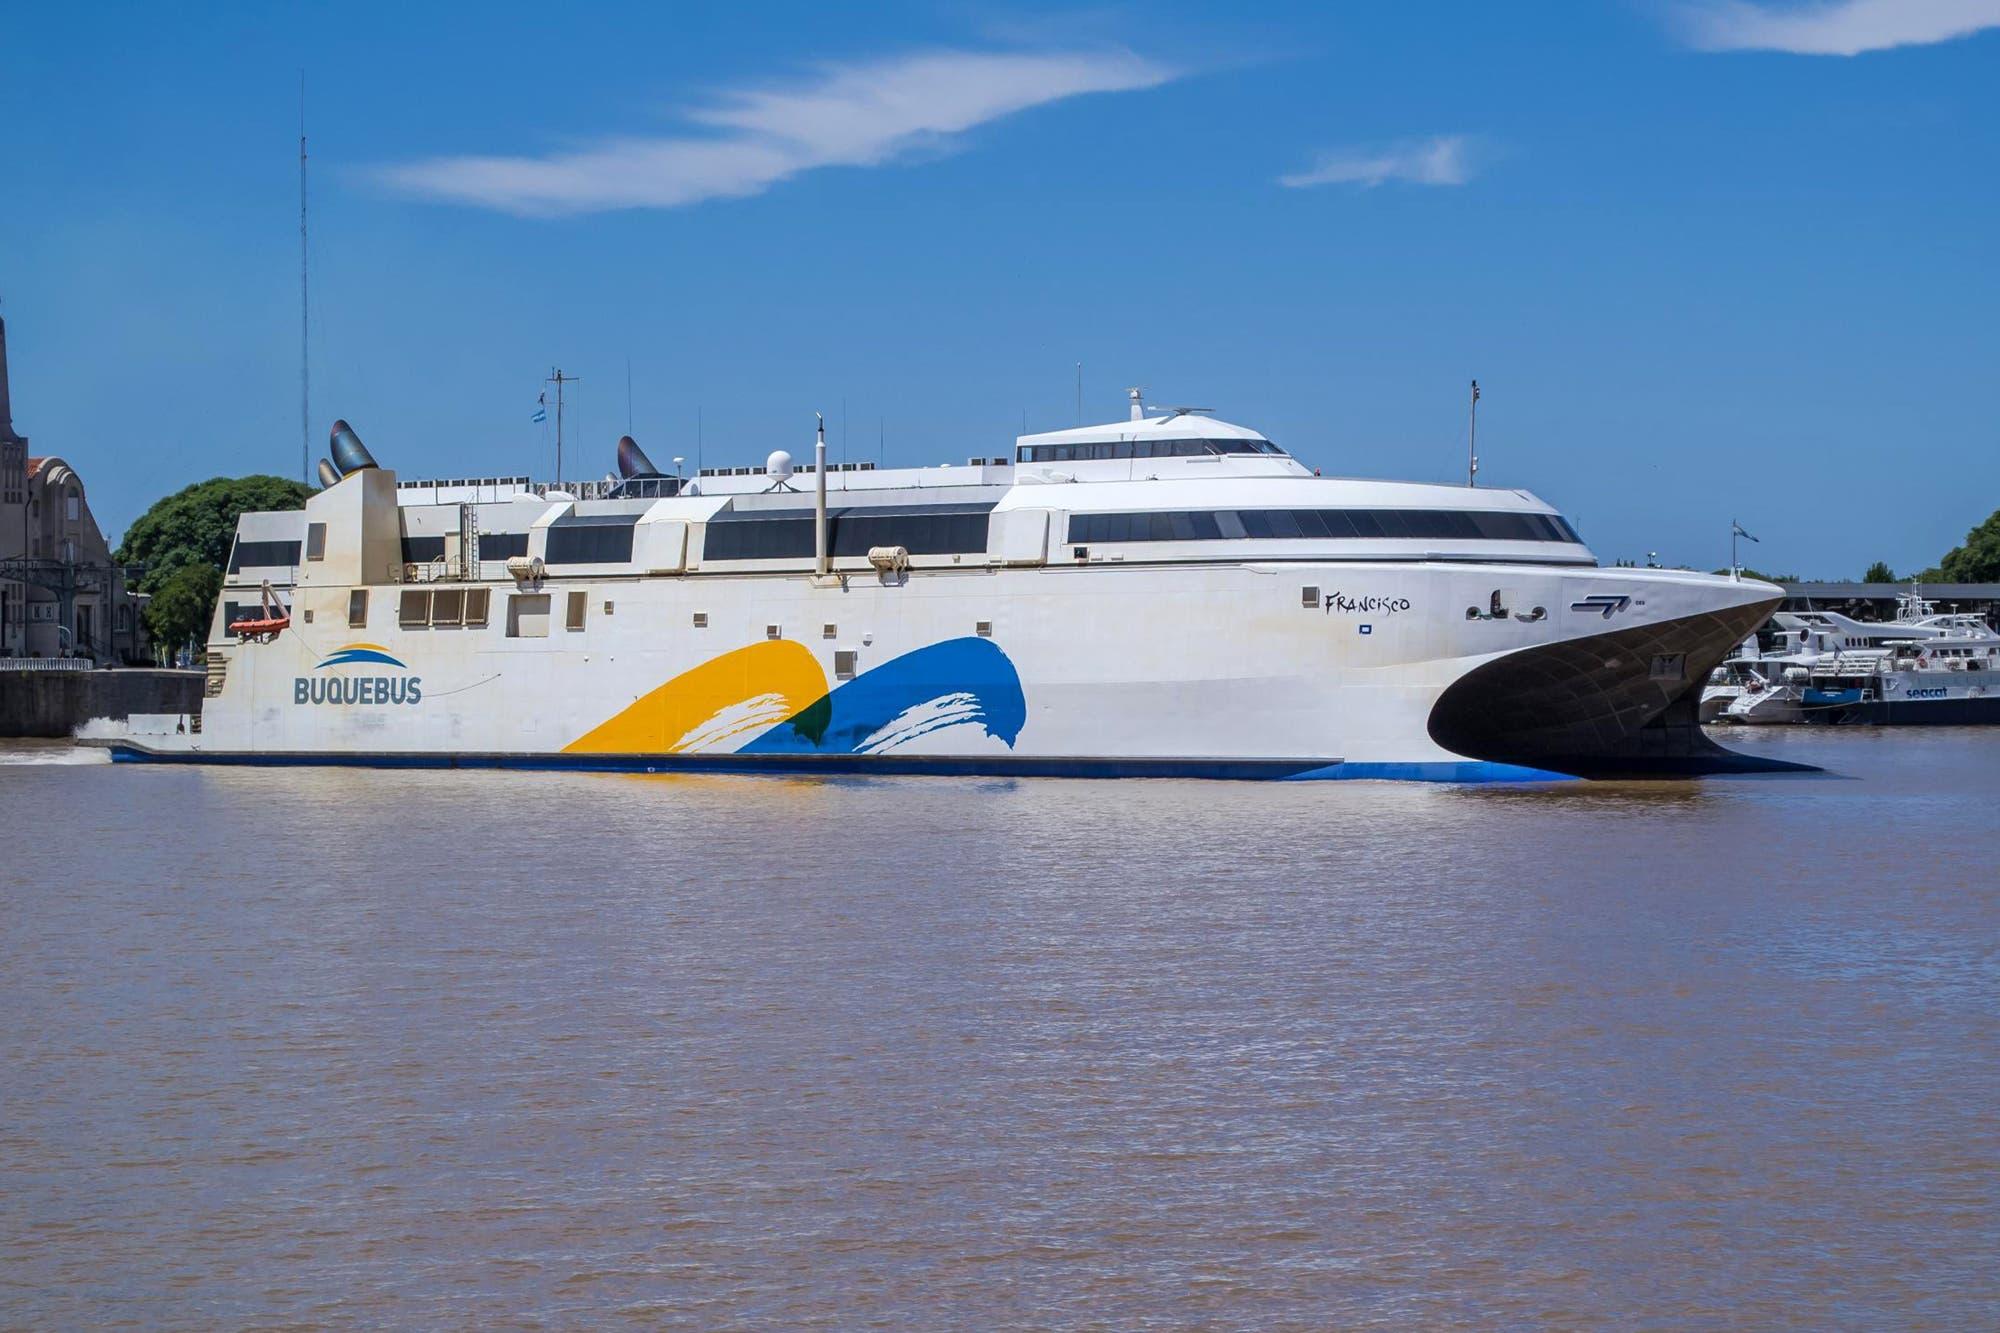 La Ciudad demandará por US$ 700 mil al joven que se subió a un barco a pesar de tener coronavirus